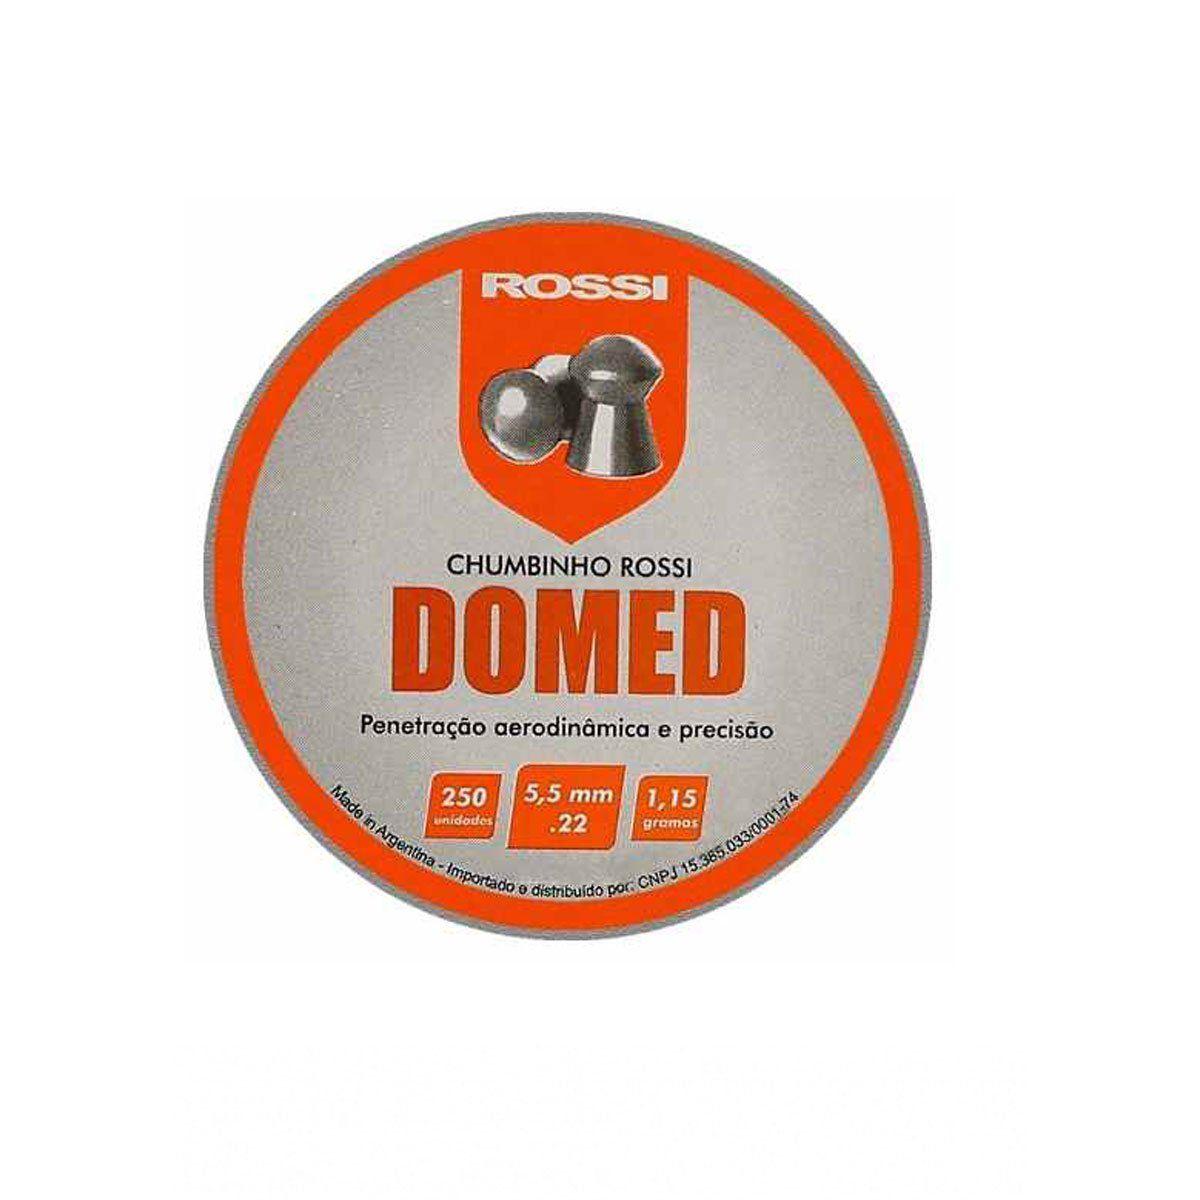 Chumbinho Rossi Domed 5,5 mm 250 unidades